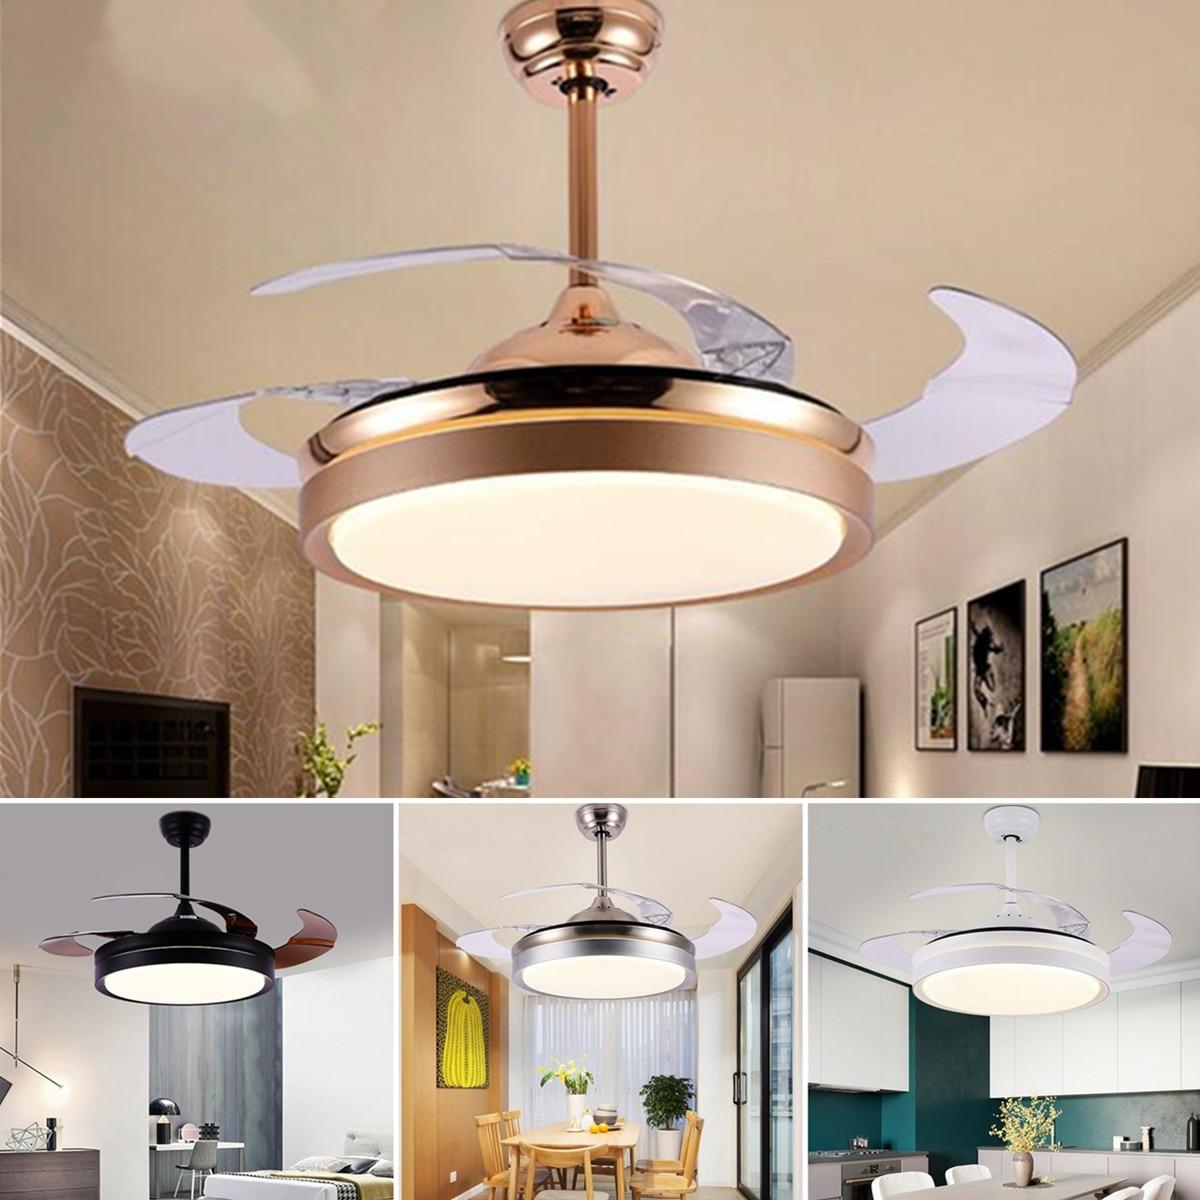 Modern Ceiling Fan Indoor Lightings Led Lamp Ceiling Fans Lights Acrylic Leaf Ceiling Fans 220v 42 Inch For Livingroom Parlor Ceiling Lights & Fans